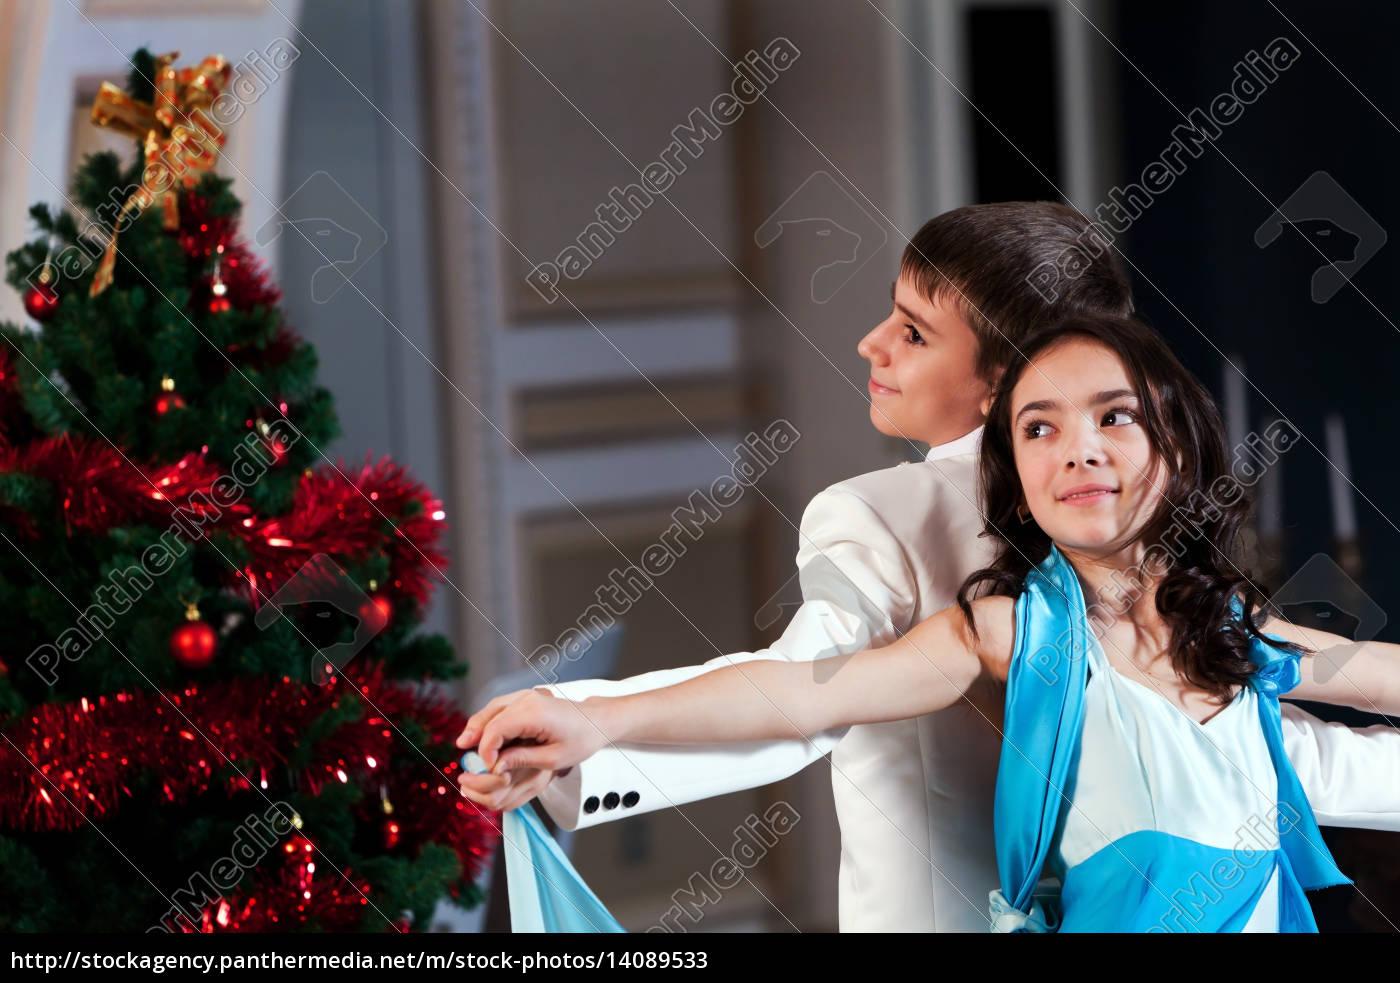 romantic, dance - 14089533